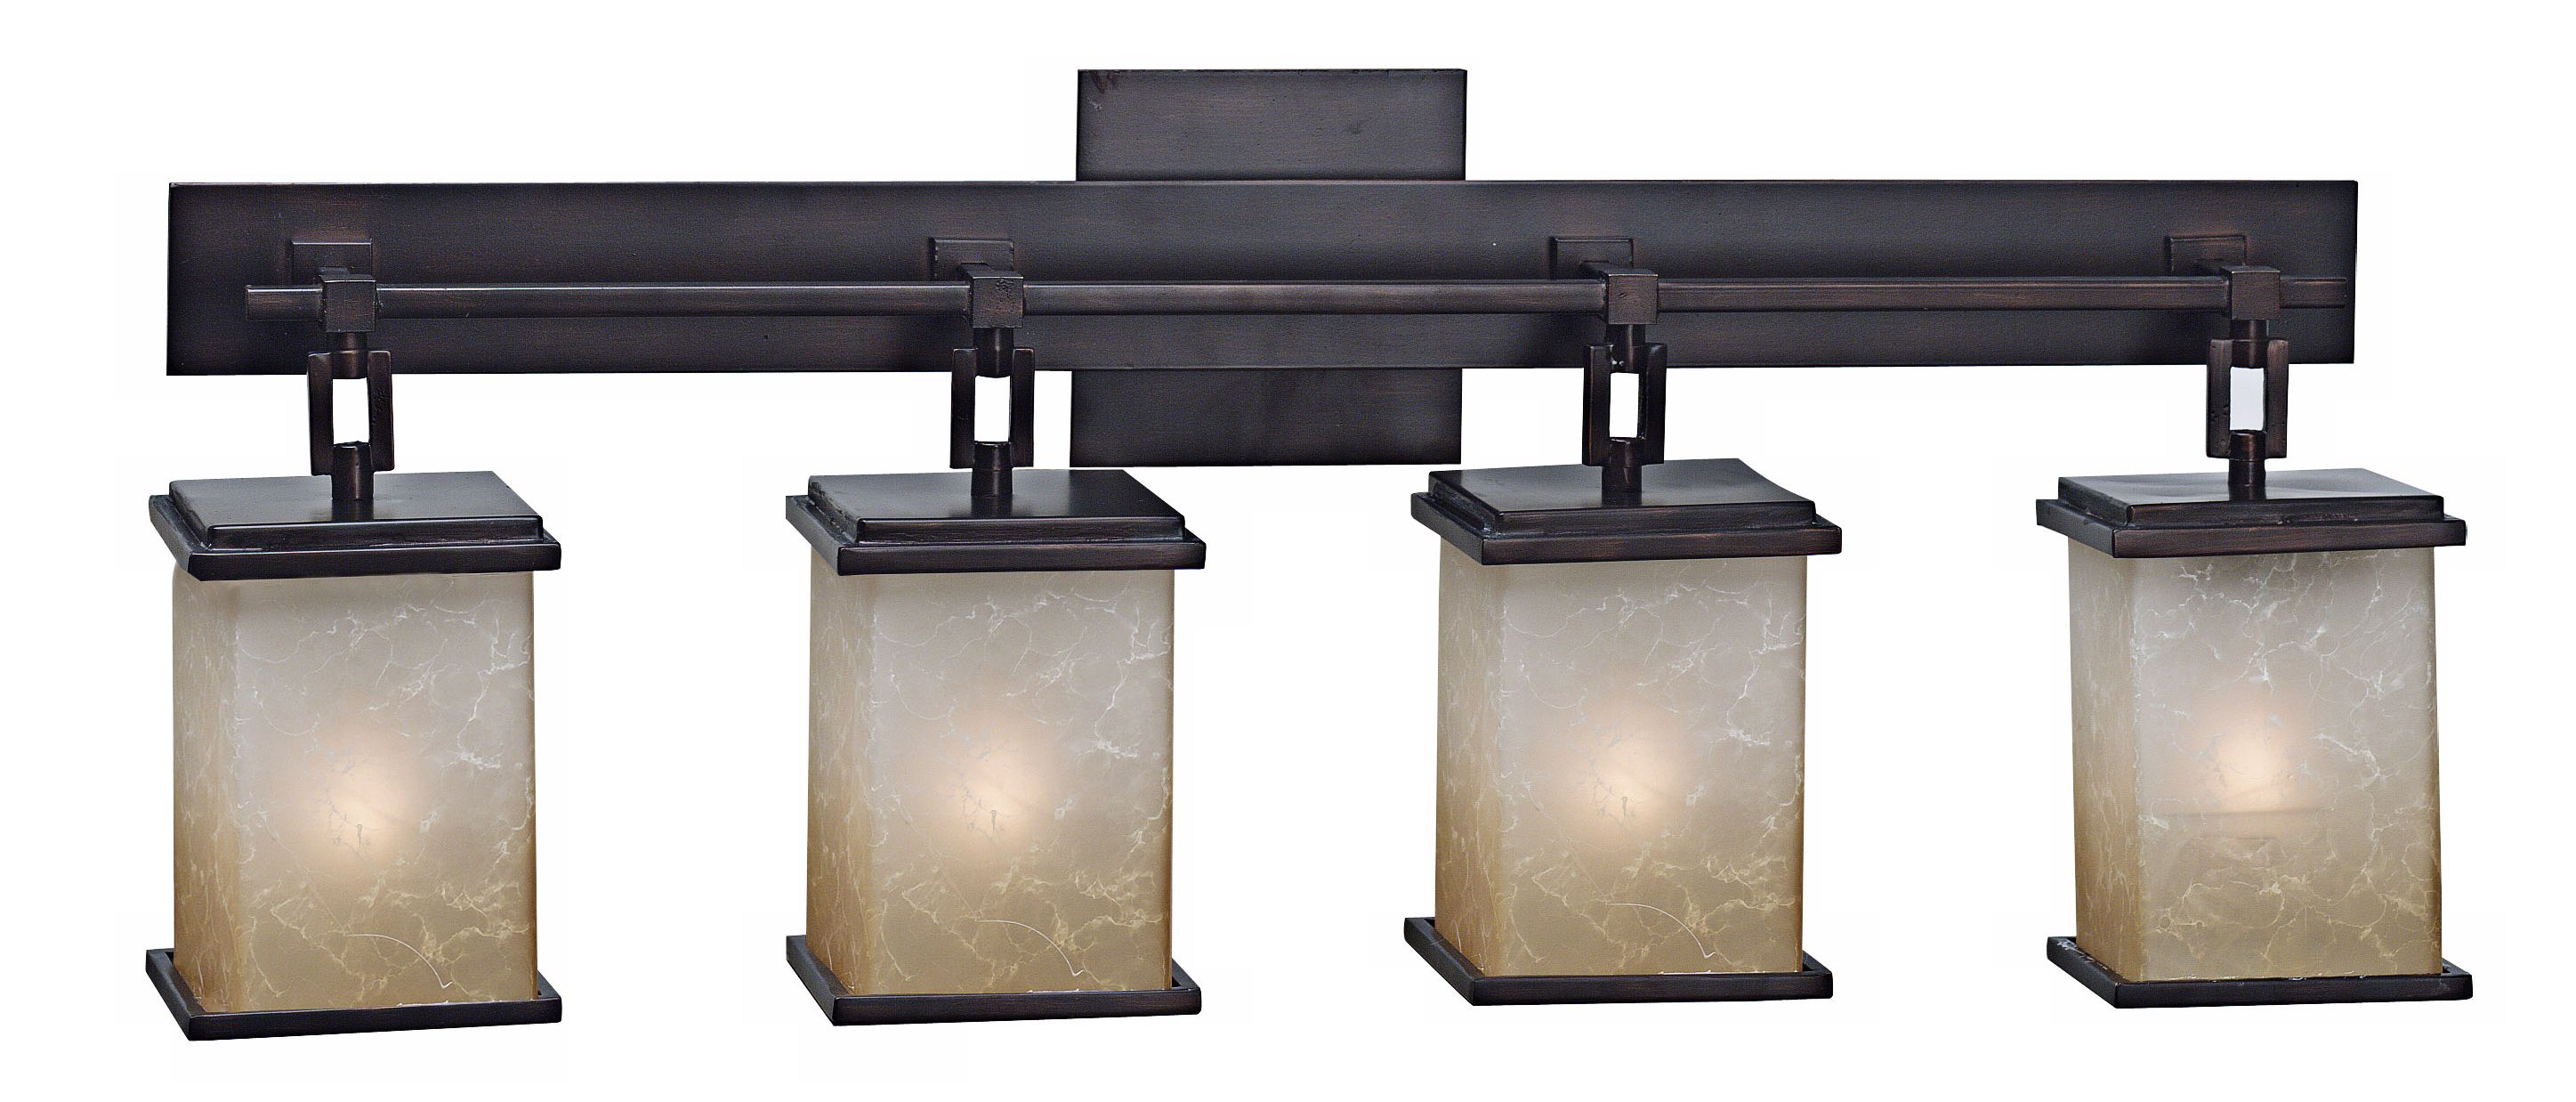 Corteo Collection Four Light Bath Light Fixture